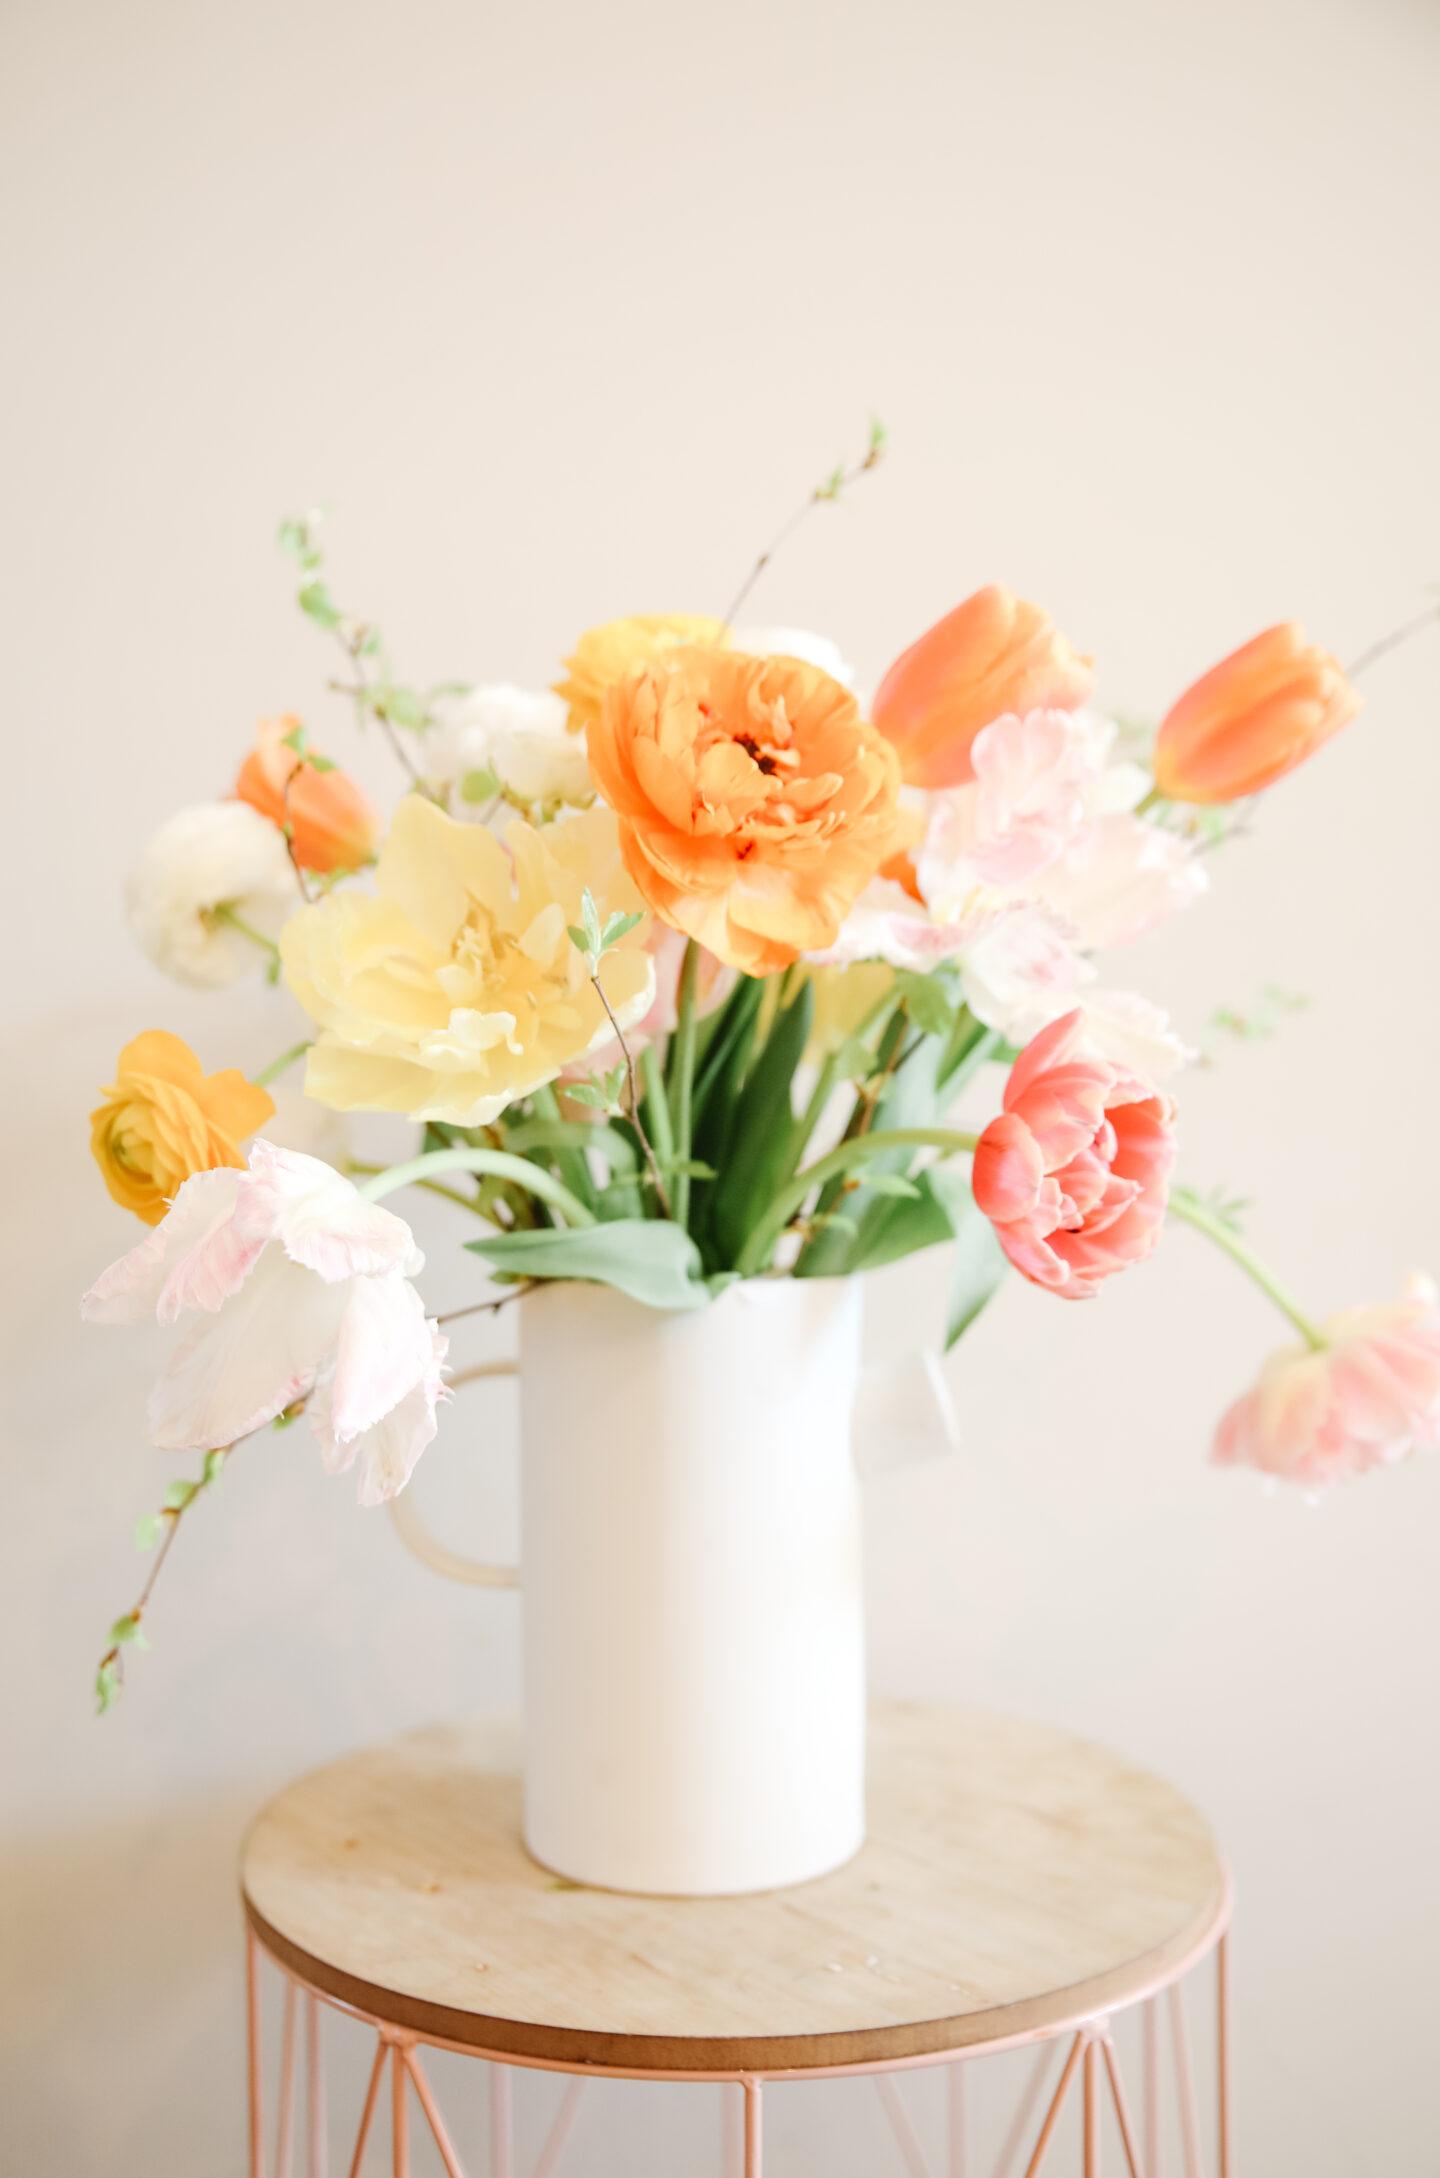 Style flowers like a florist